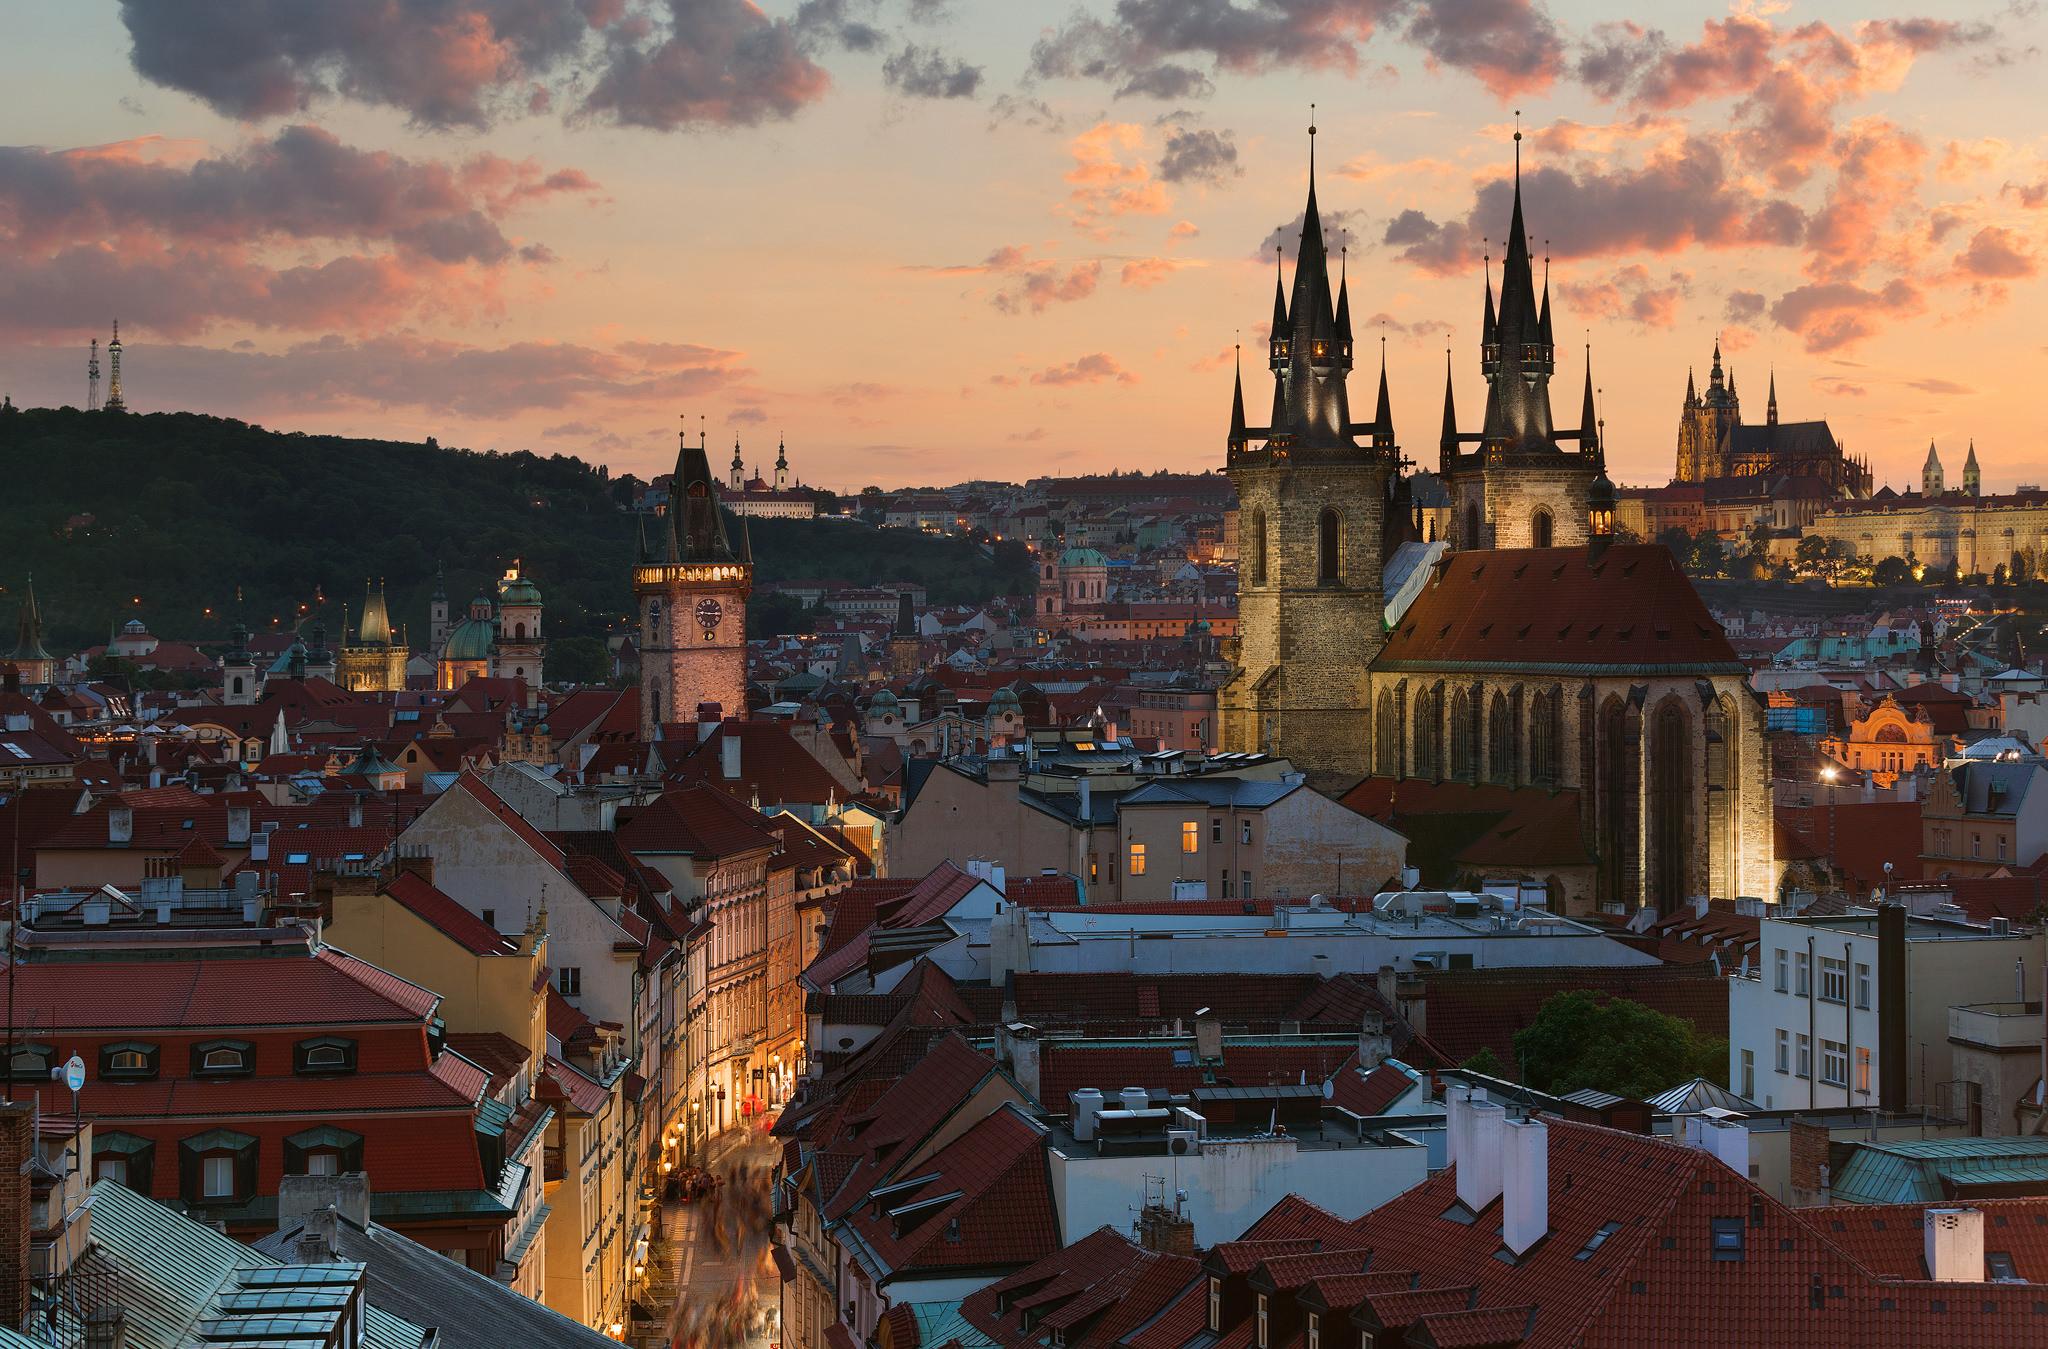 Roofs-of-Prague.jpg